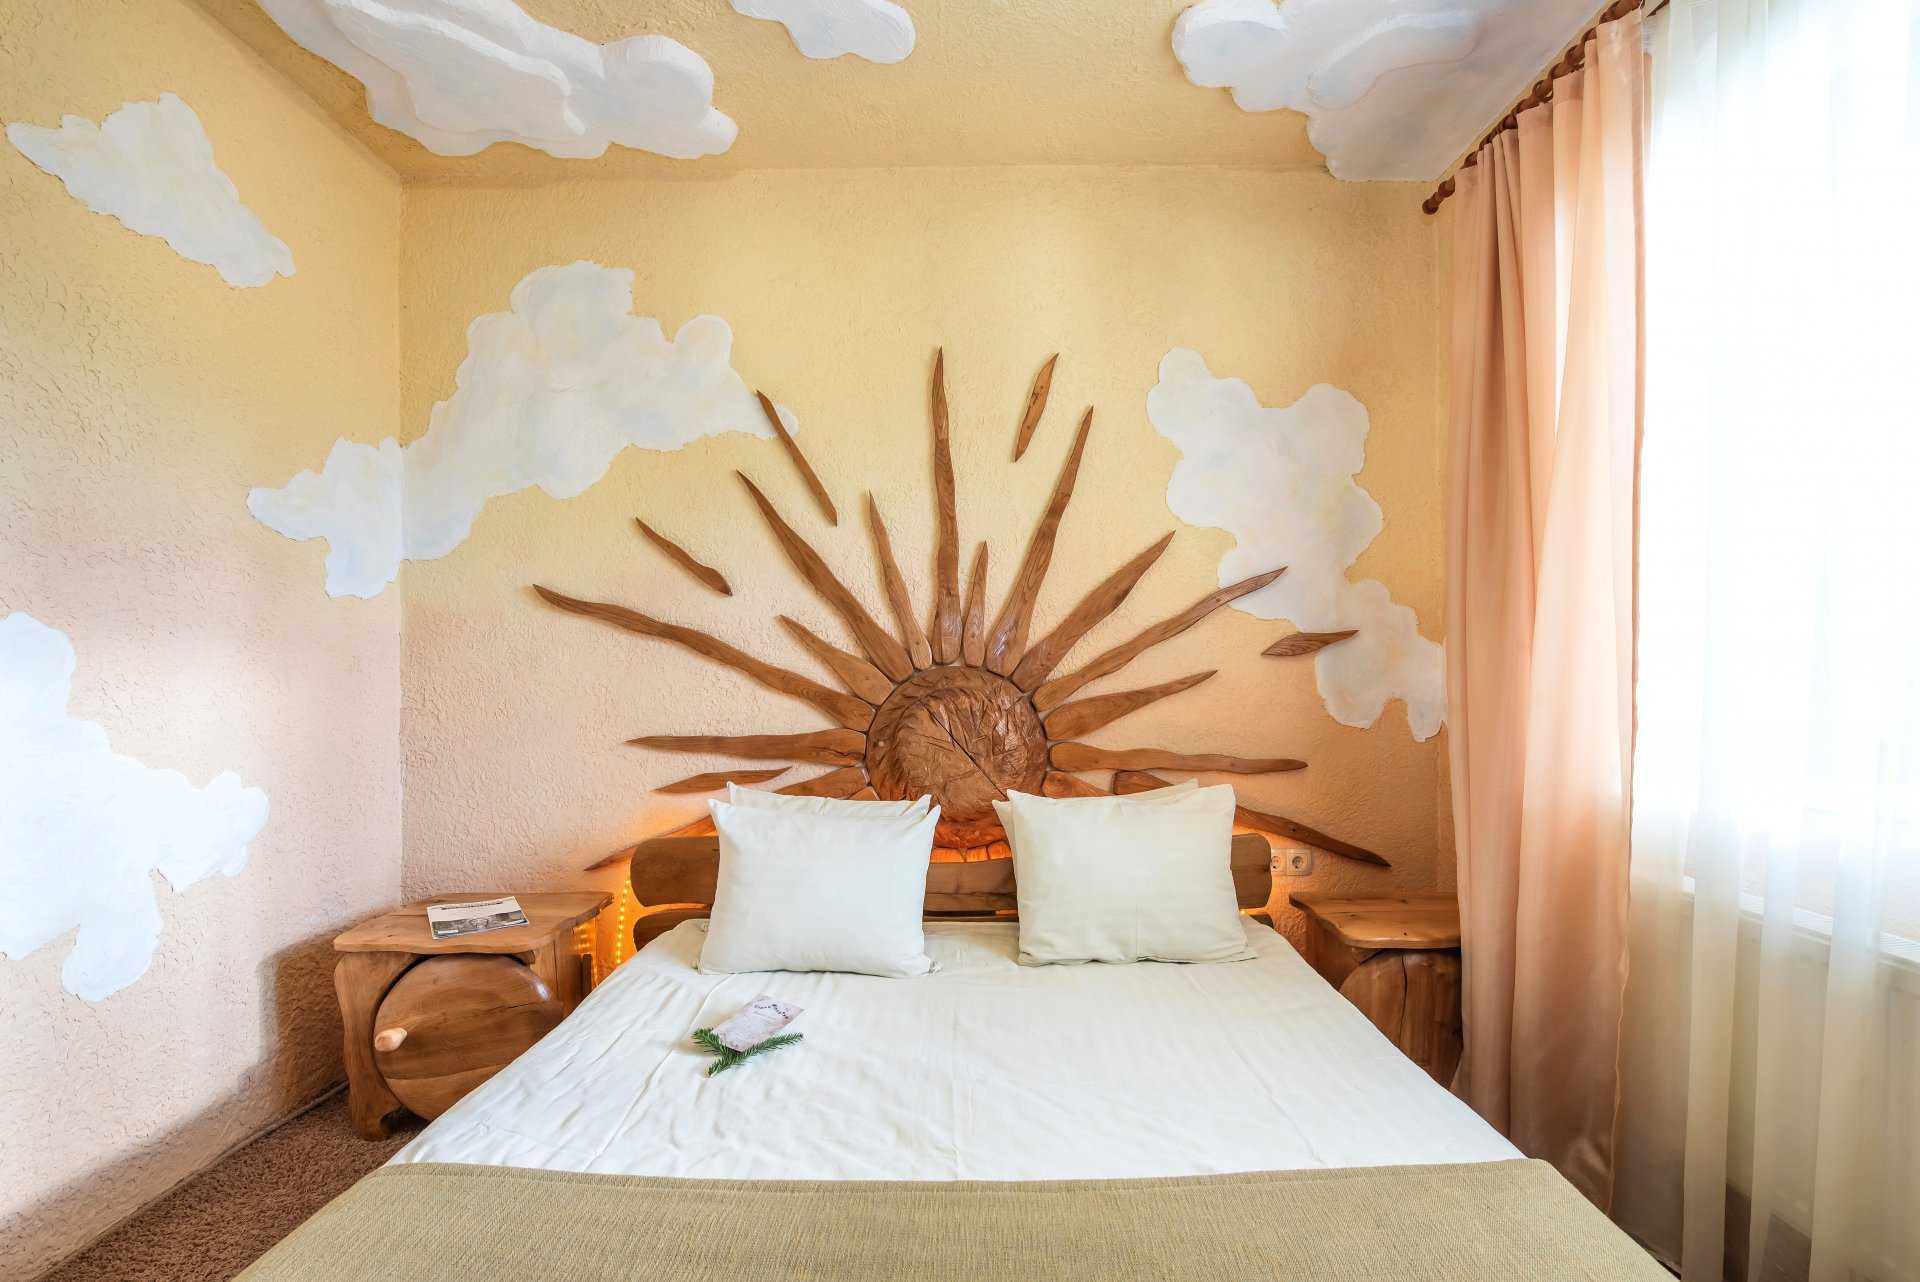 Стандарт Сонячний у готелі Стара Правда